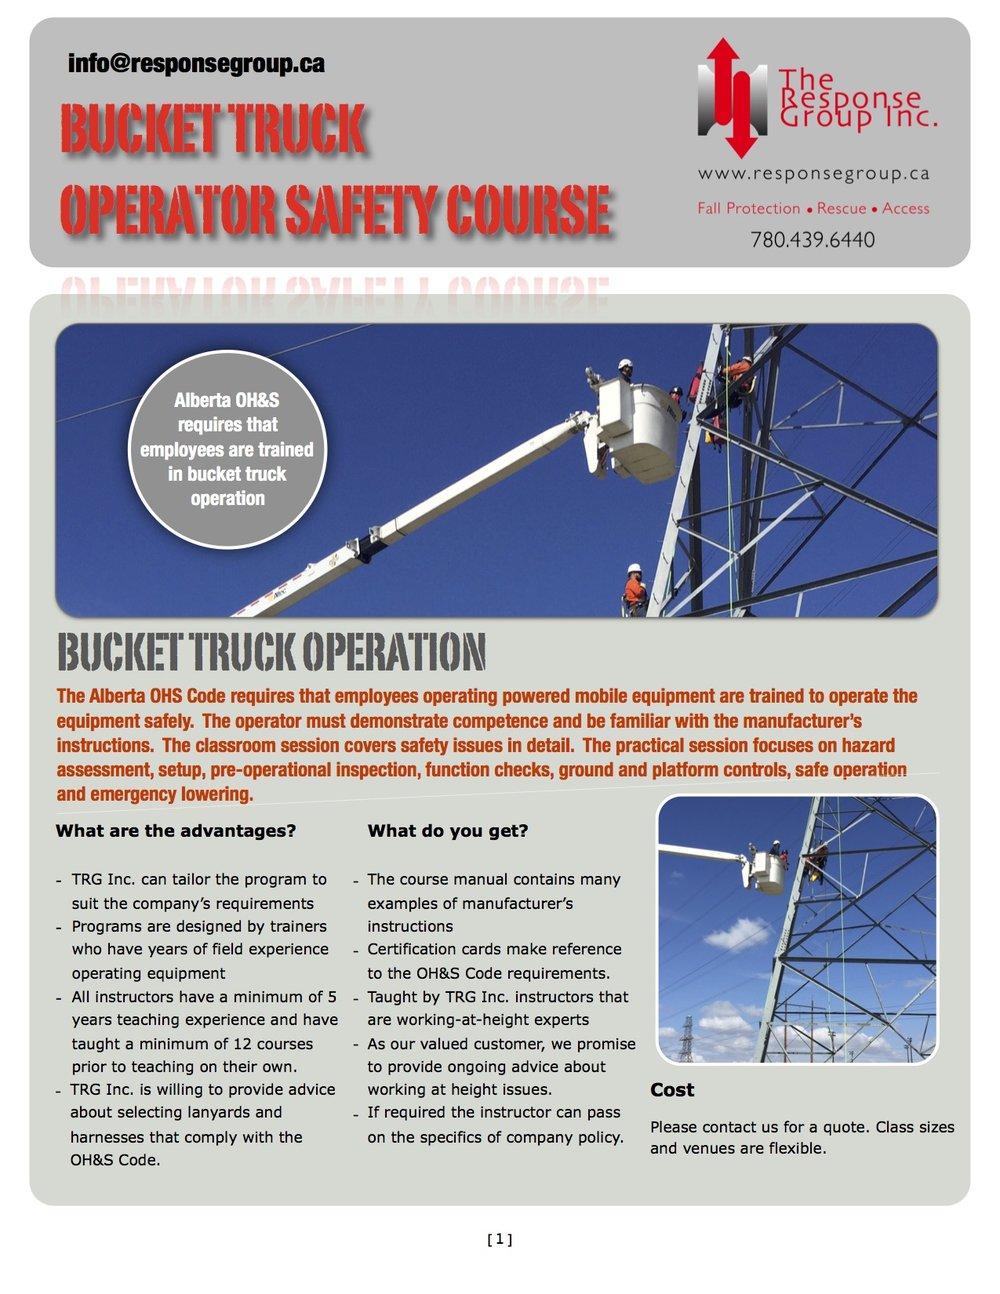 bucket truck brochure jpeg.jpg